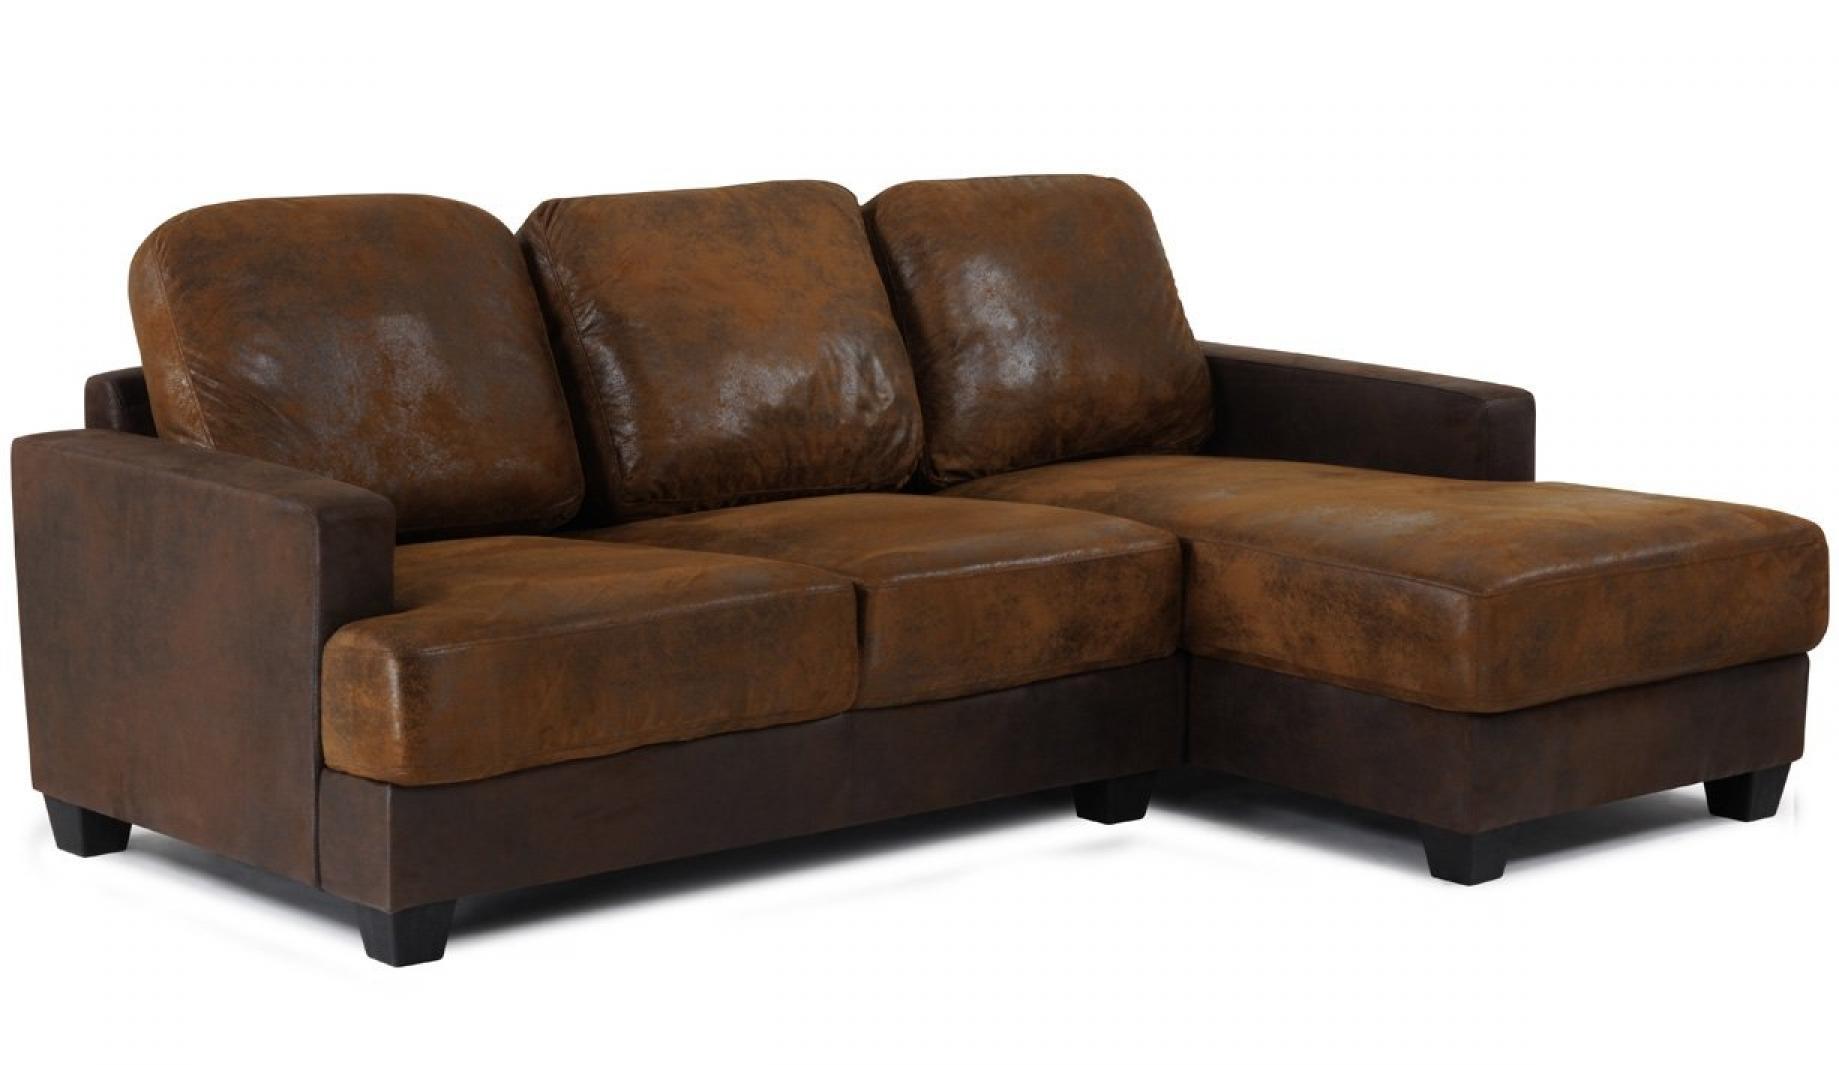 photos canap cuir vieilli. Black Bedroom Furniture Sets. Home Design Ideas